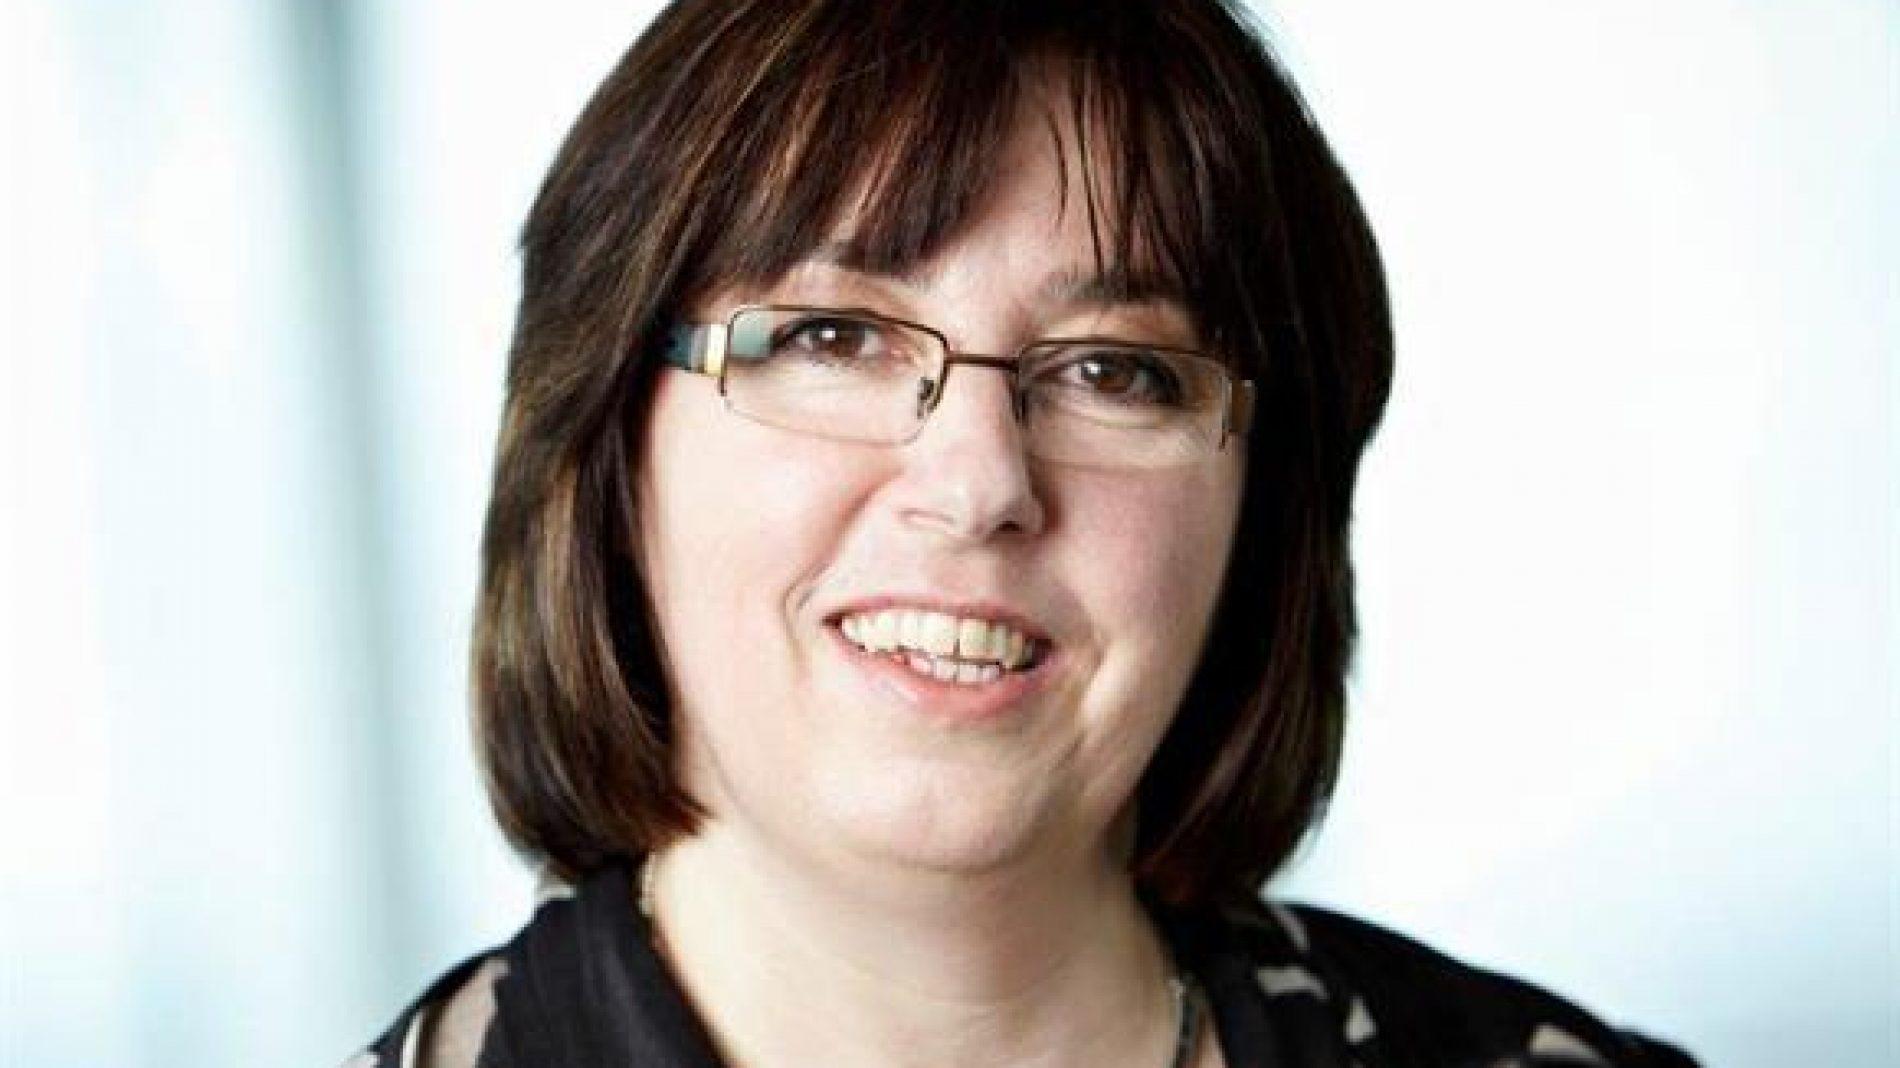 Ruth Sutherland, CEO of the Samaritans